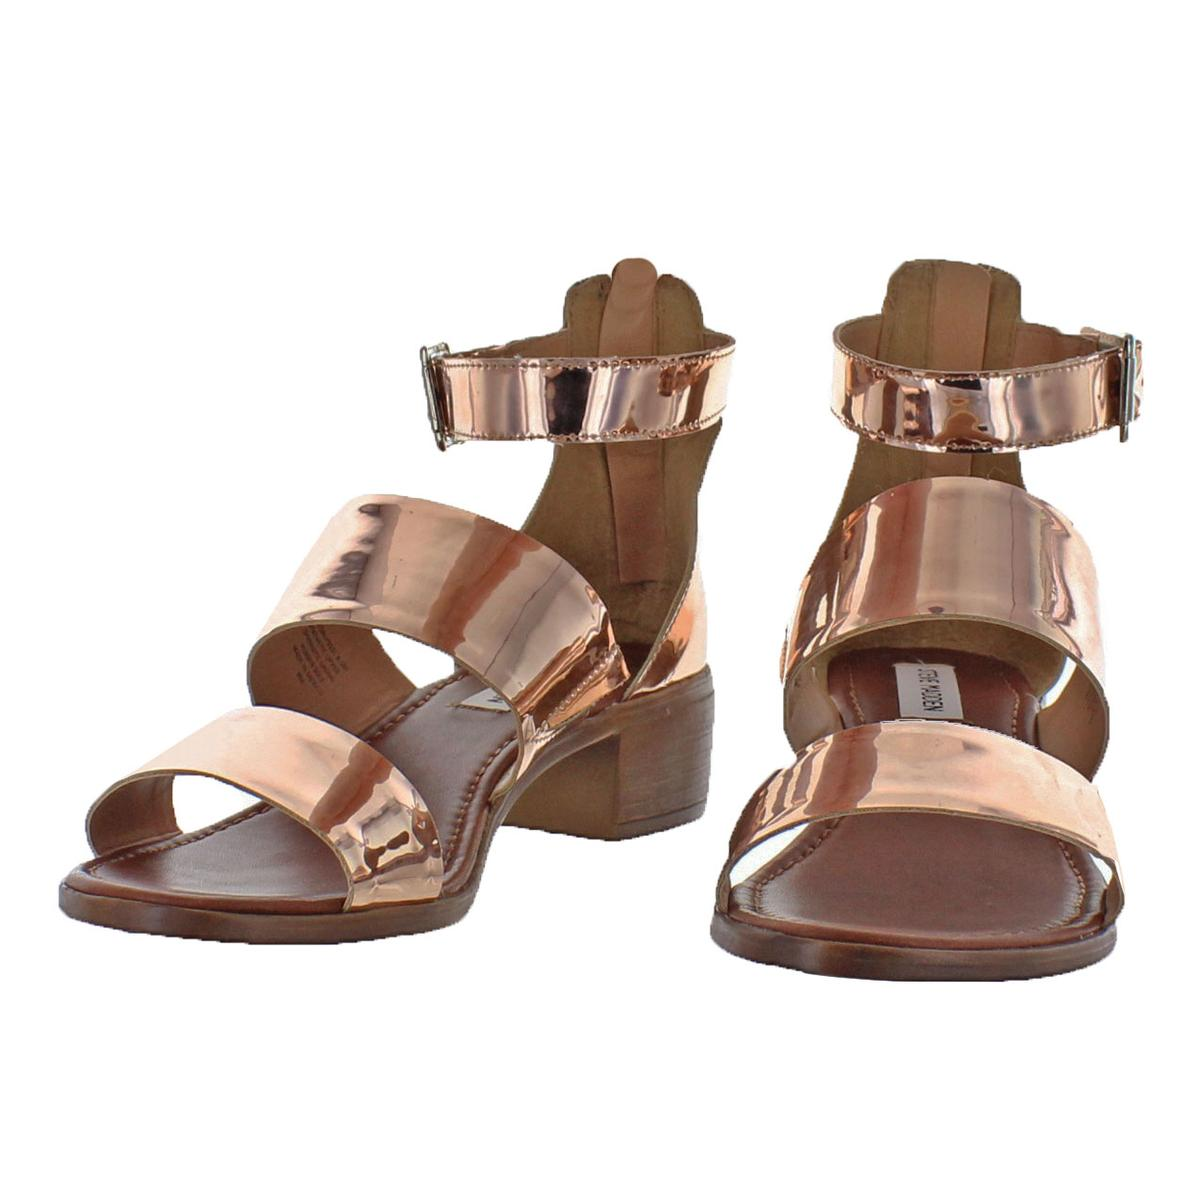 Steve-Madden-Womens-Daly-Leather-Open-Toe-Dress-Heels-Sandals-BHFO-5458 thumbnail 9